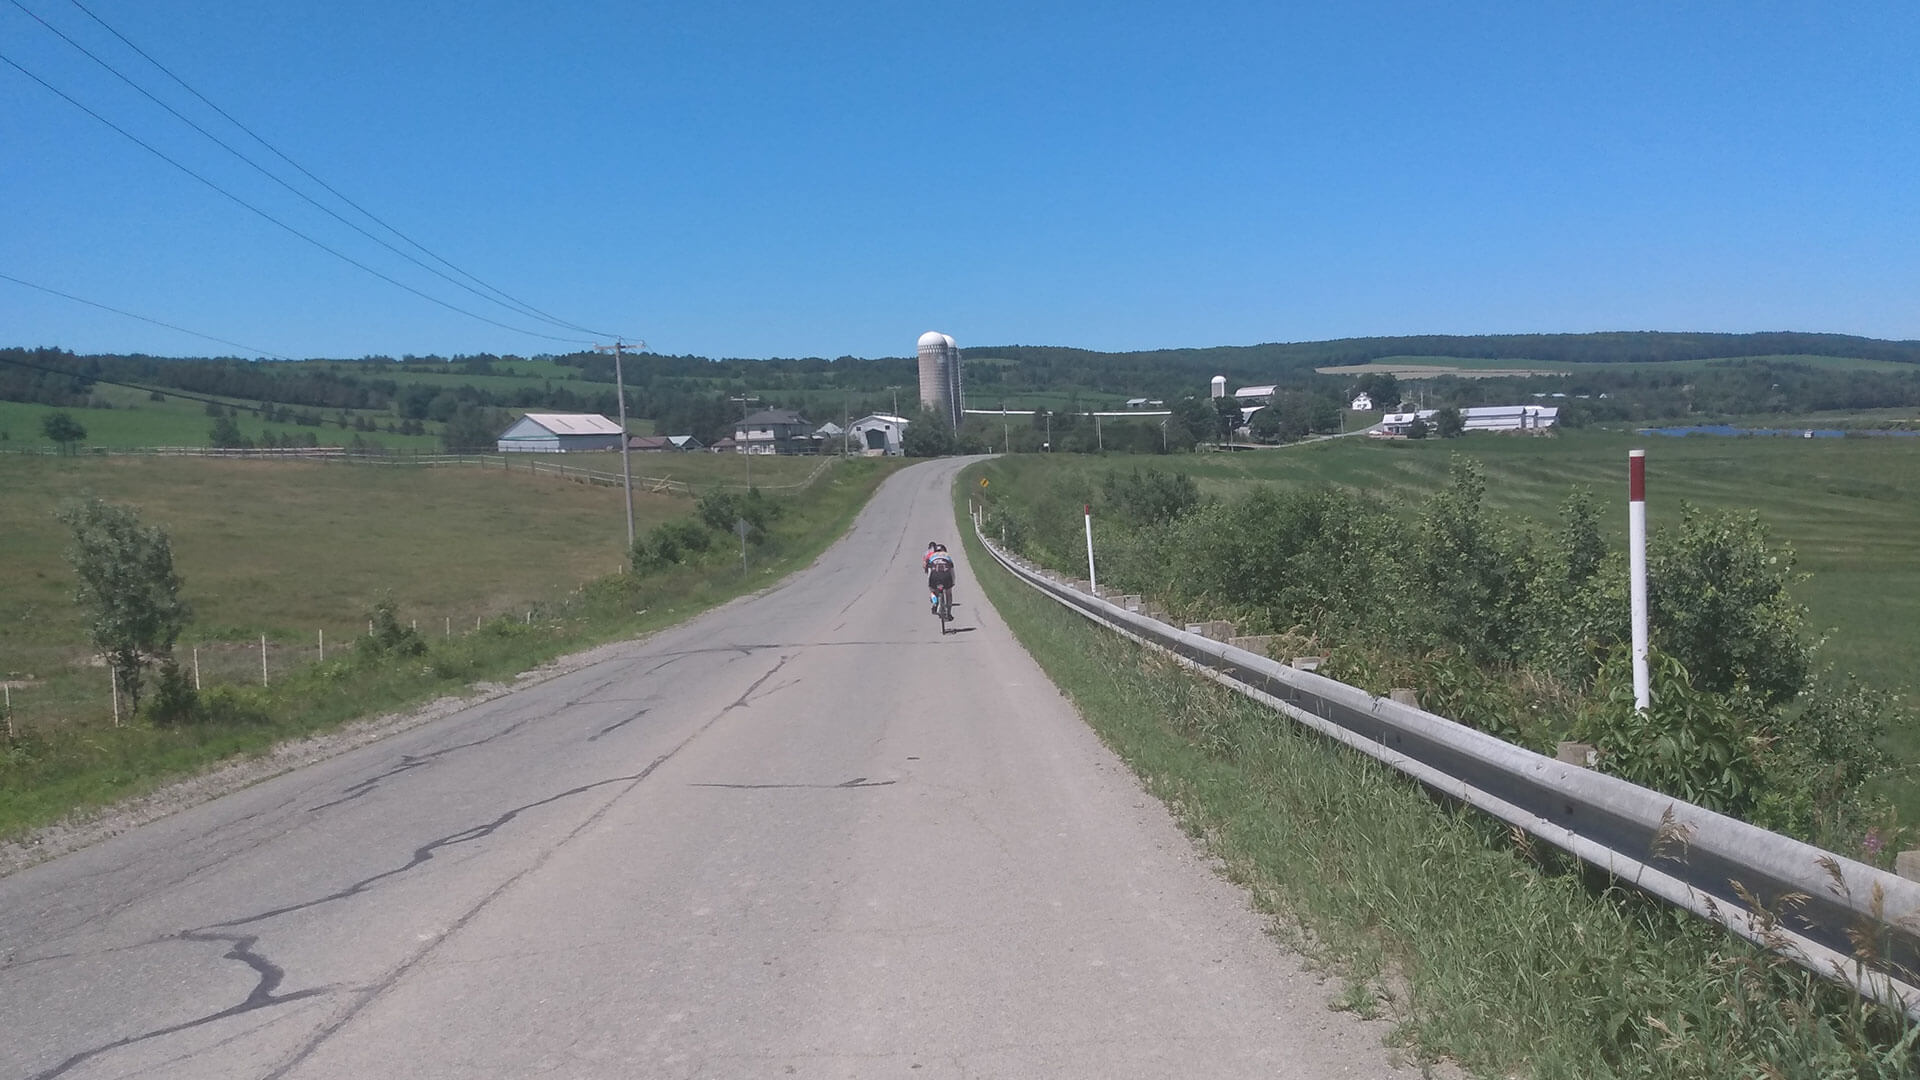 Cyclotourisme au Centre-du-Québec